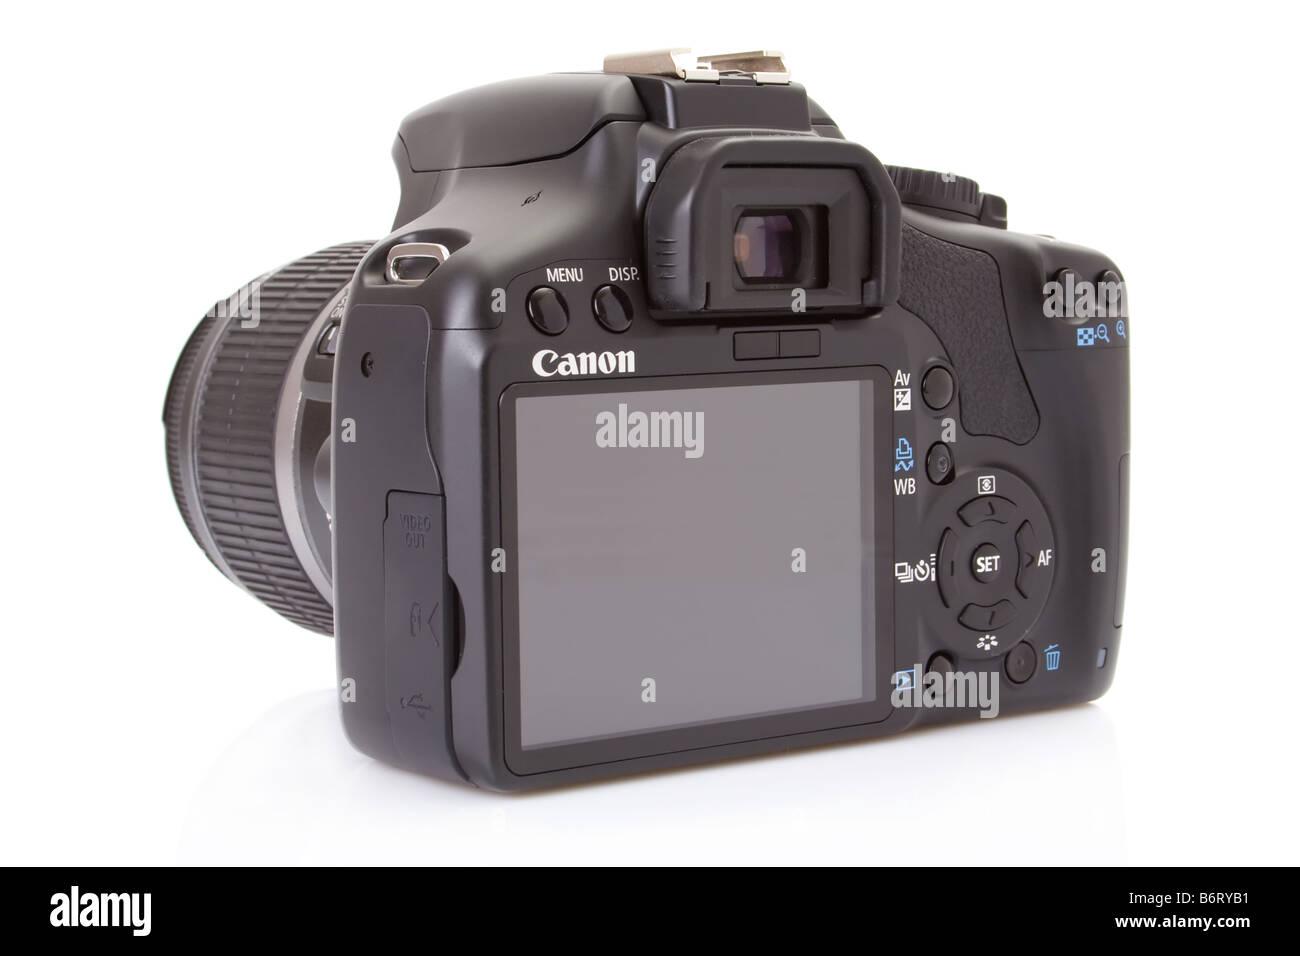 Canon EOS 450D (Rebel XSi), 12 megapixel digital slr, with